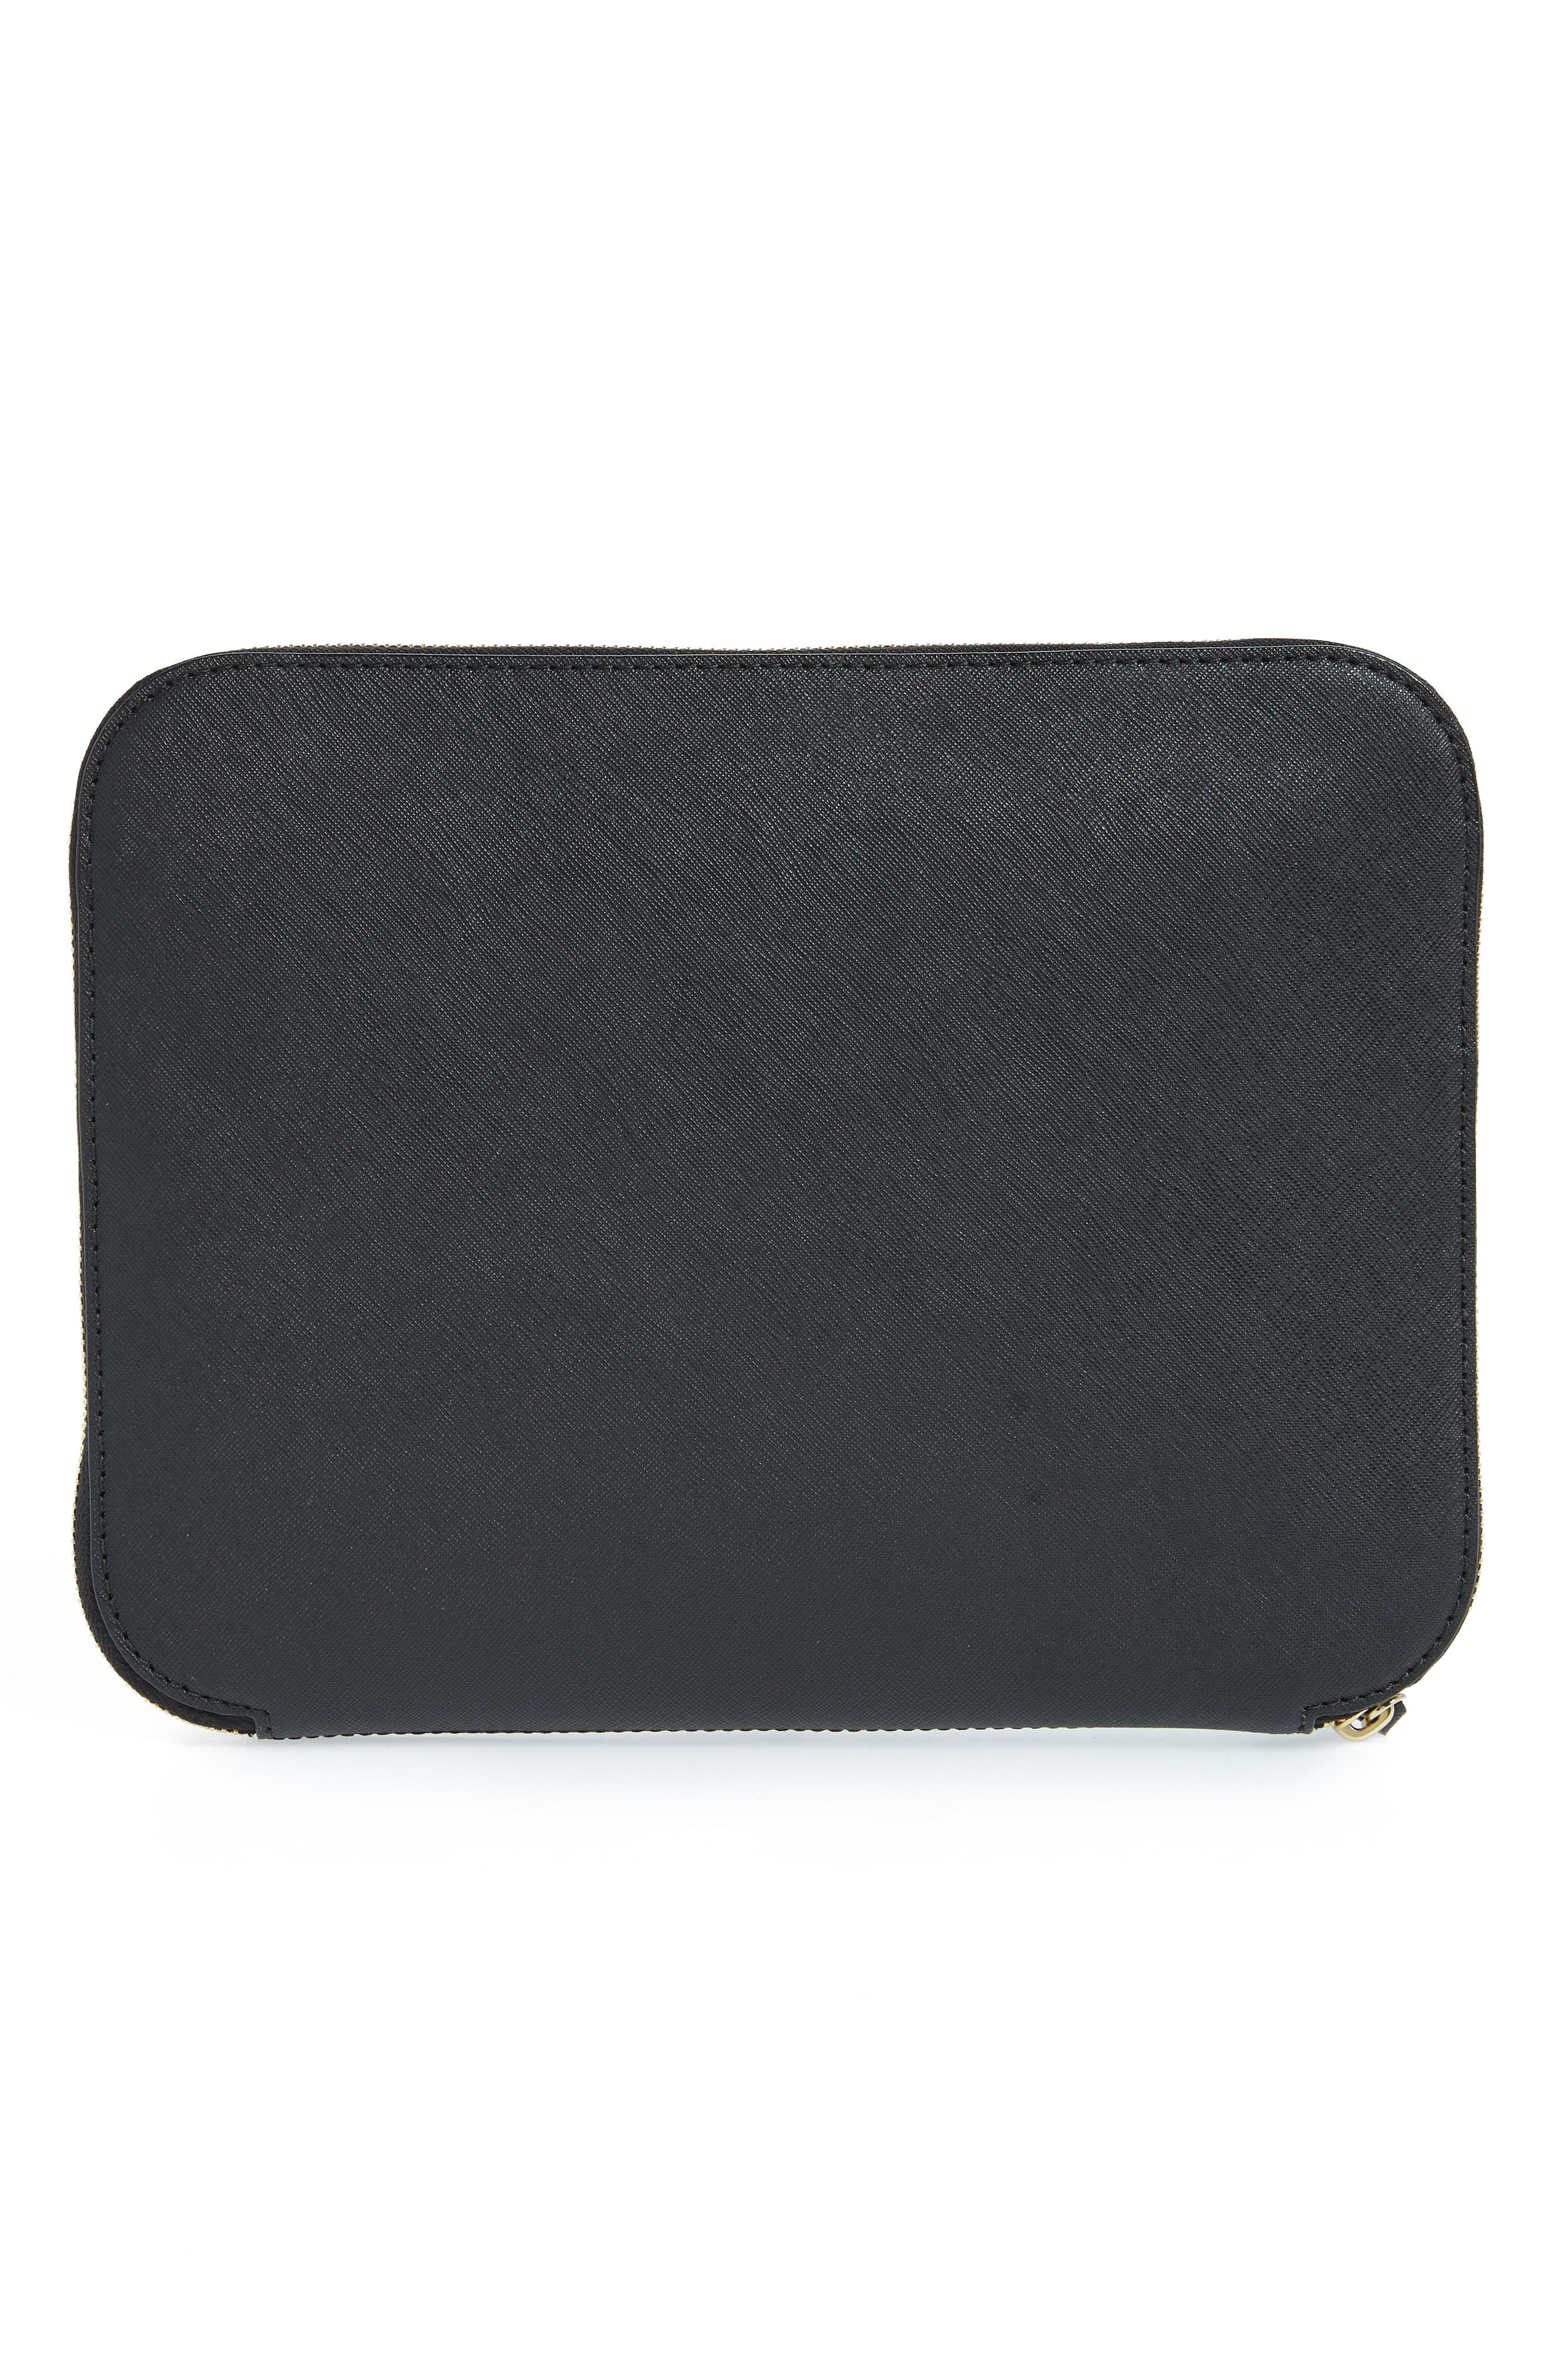 saffiano leather organization tablet sleeve,                             Alternate thumbnail 4, color,                             Black